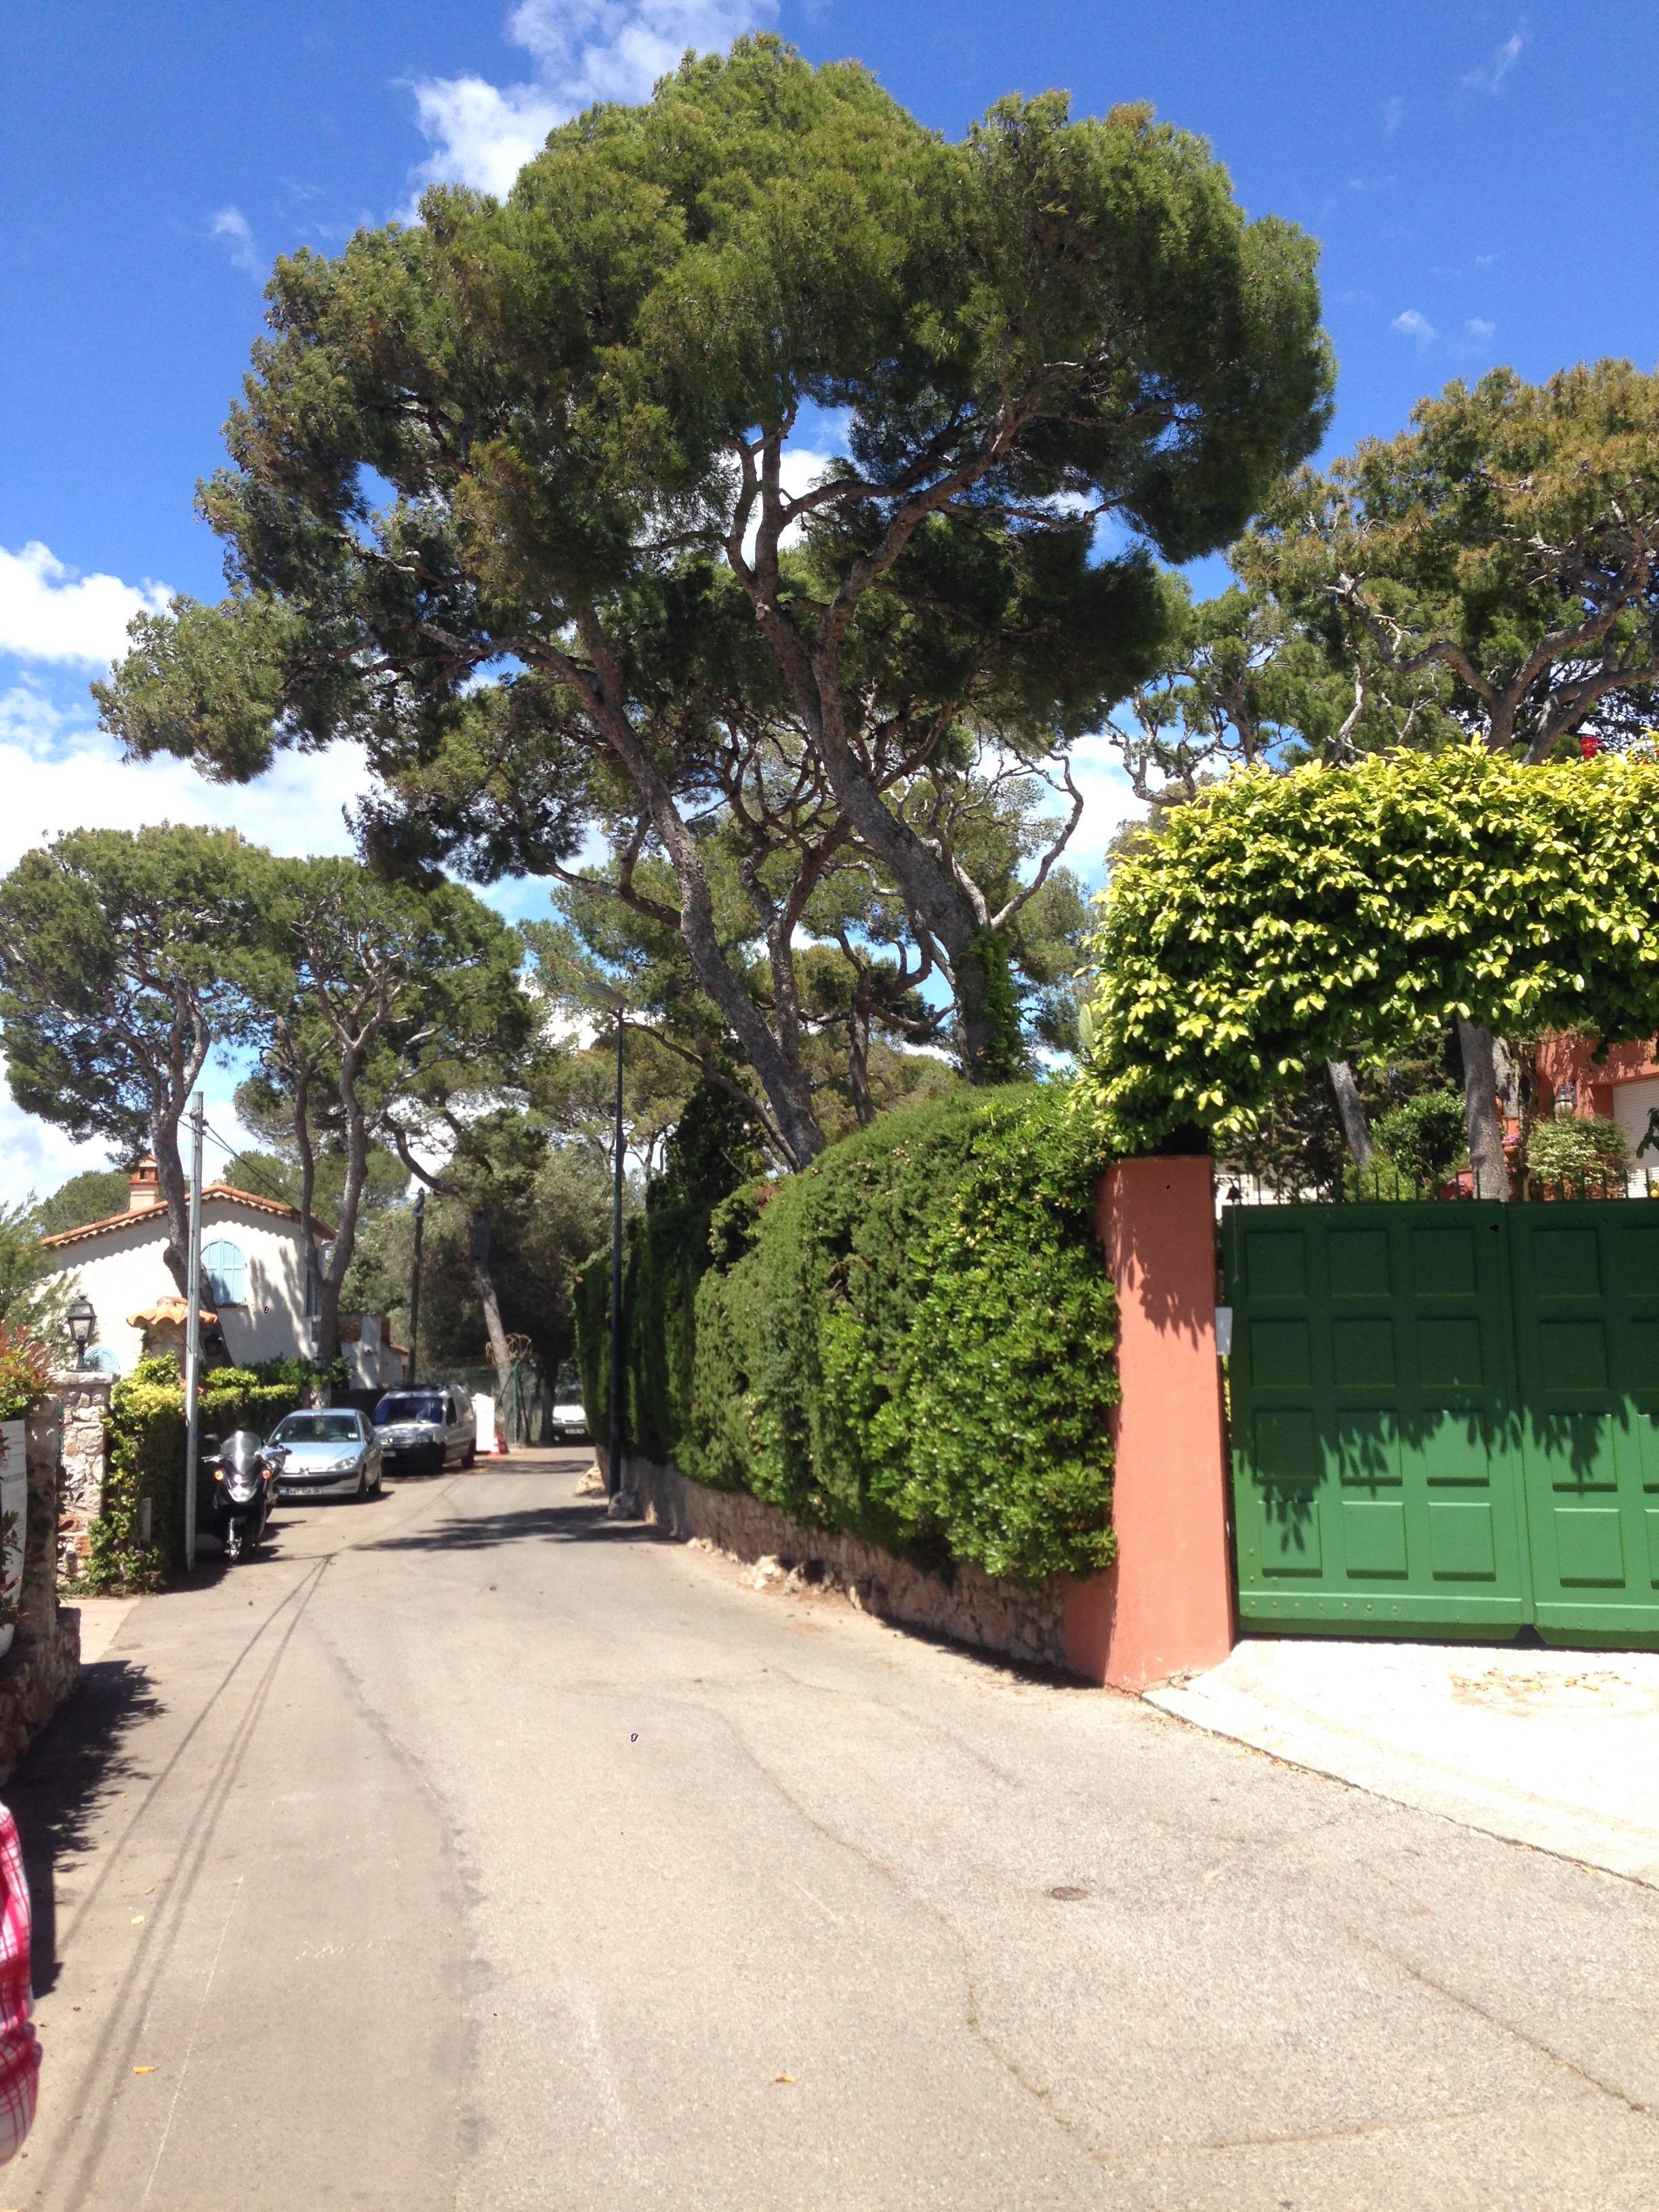 Walking around the perimeter of Saint-Jean-Cap-Ferrat. The colour combinations are an artist's dream.